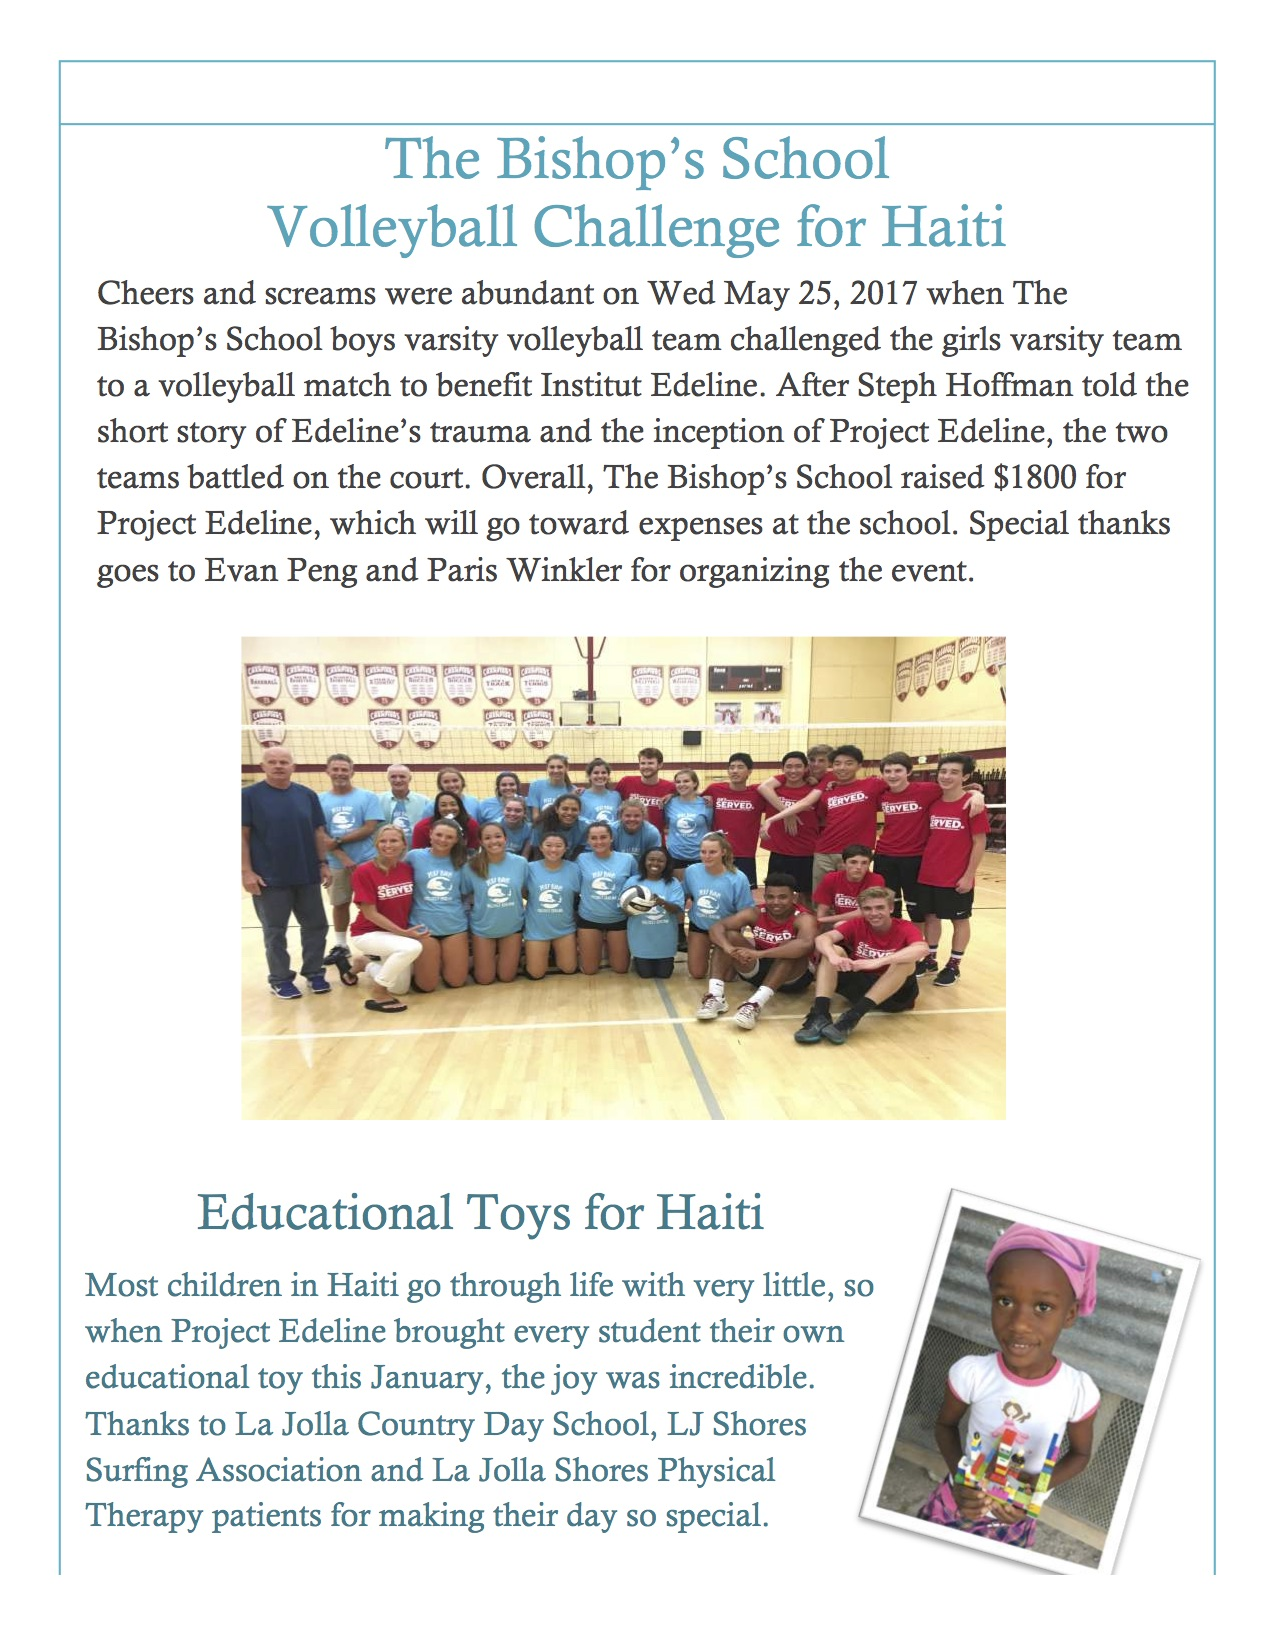 Haiti newsletter 2017-ilovepdf-compressed-6.jpg